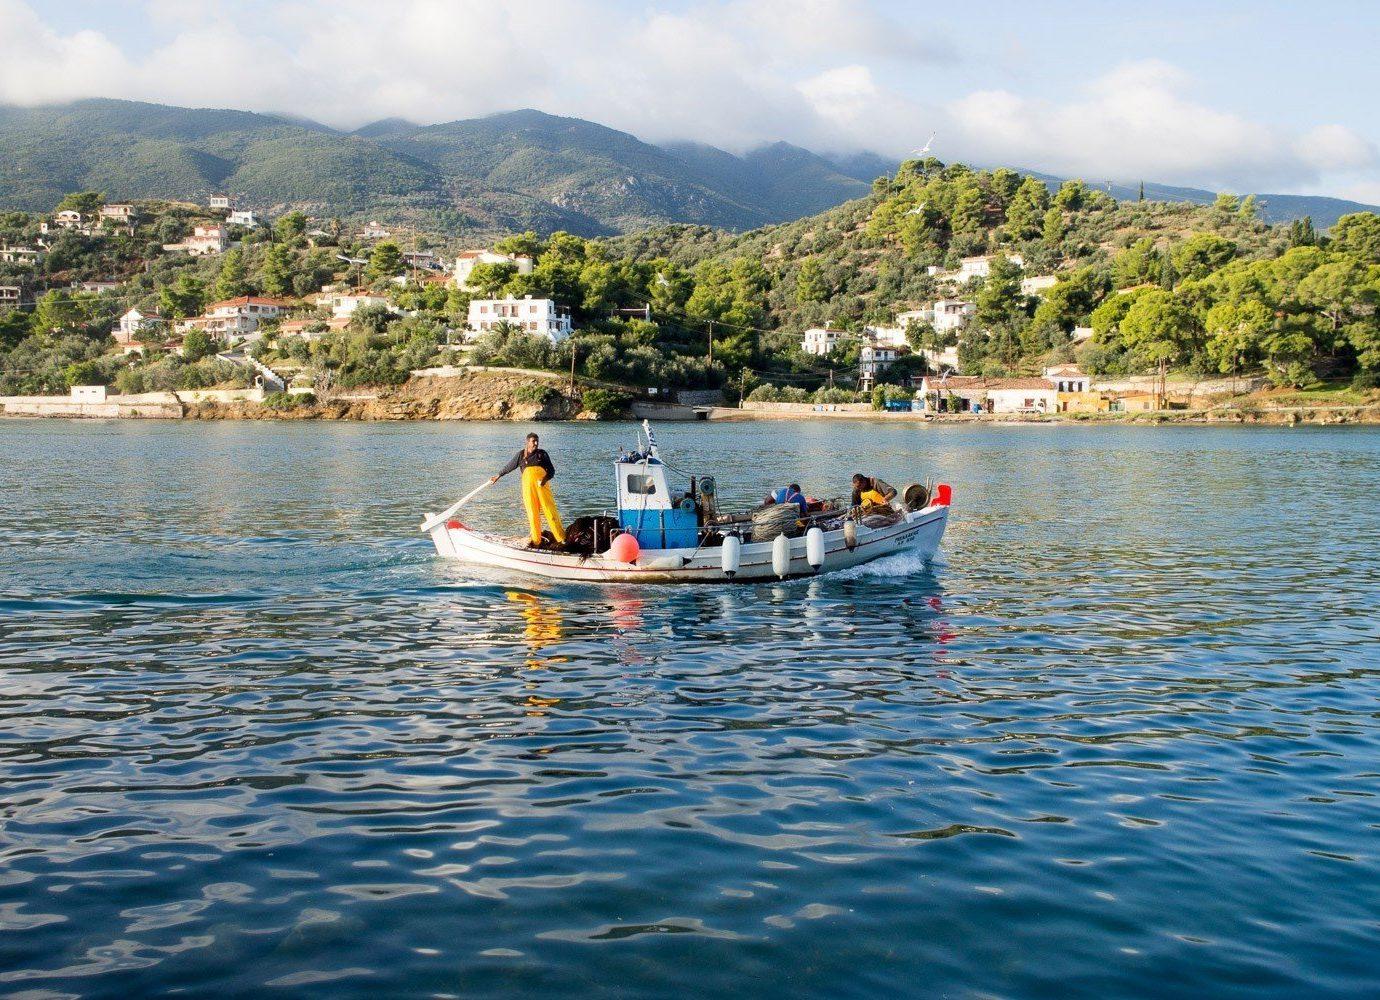 Travel Tips water outdoor mountain sky Boat boating vehicle Lake sea kayak Rowing Sport Sea kayaking kayak watercraft rowing watercraft bay sports equipment paddle swimming